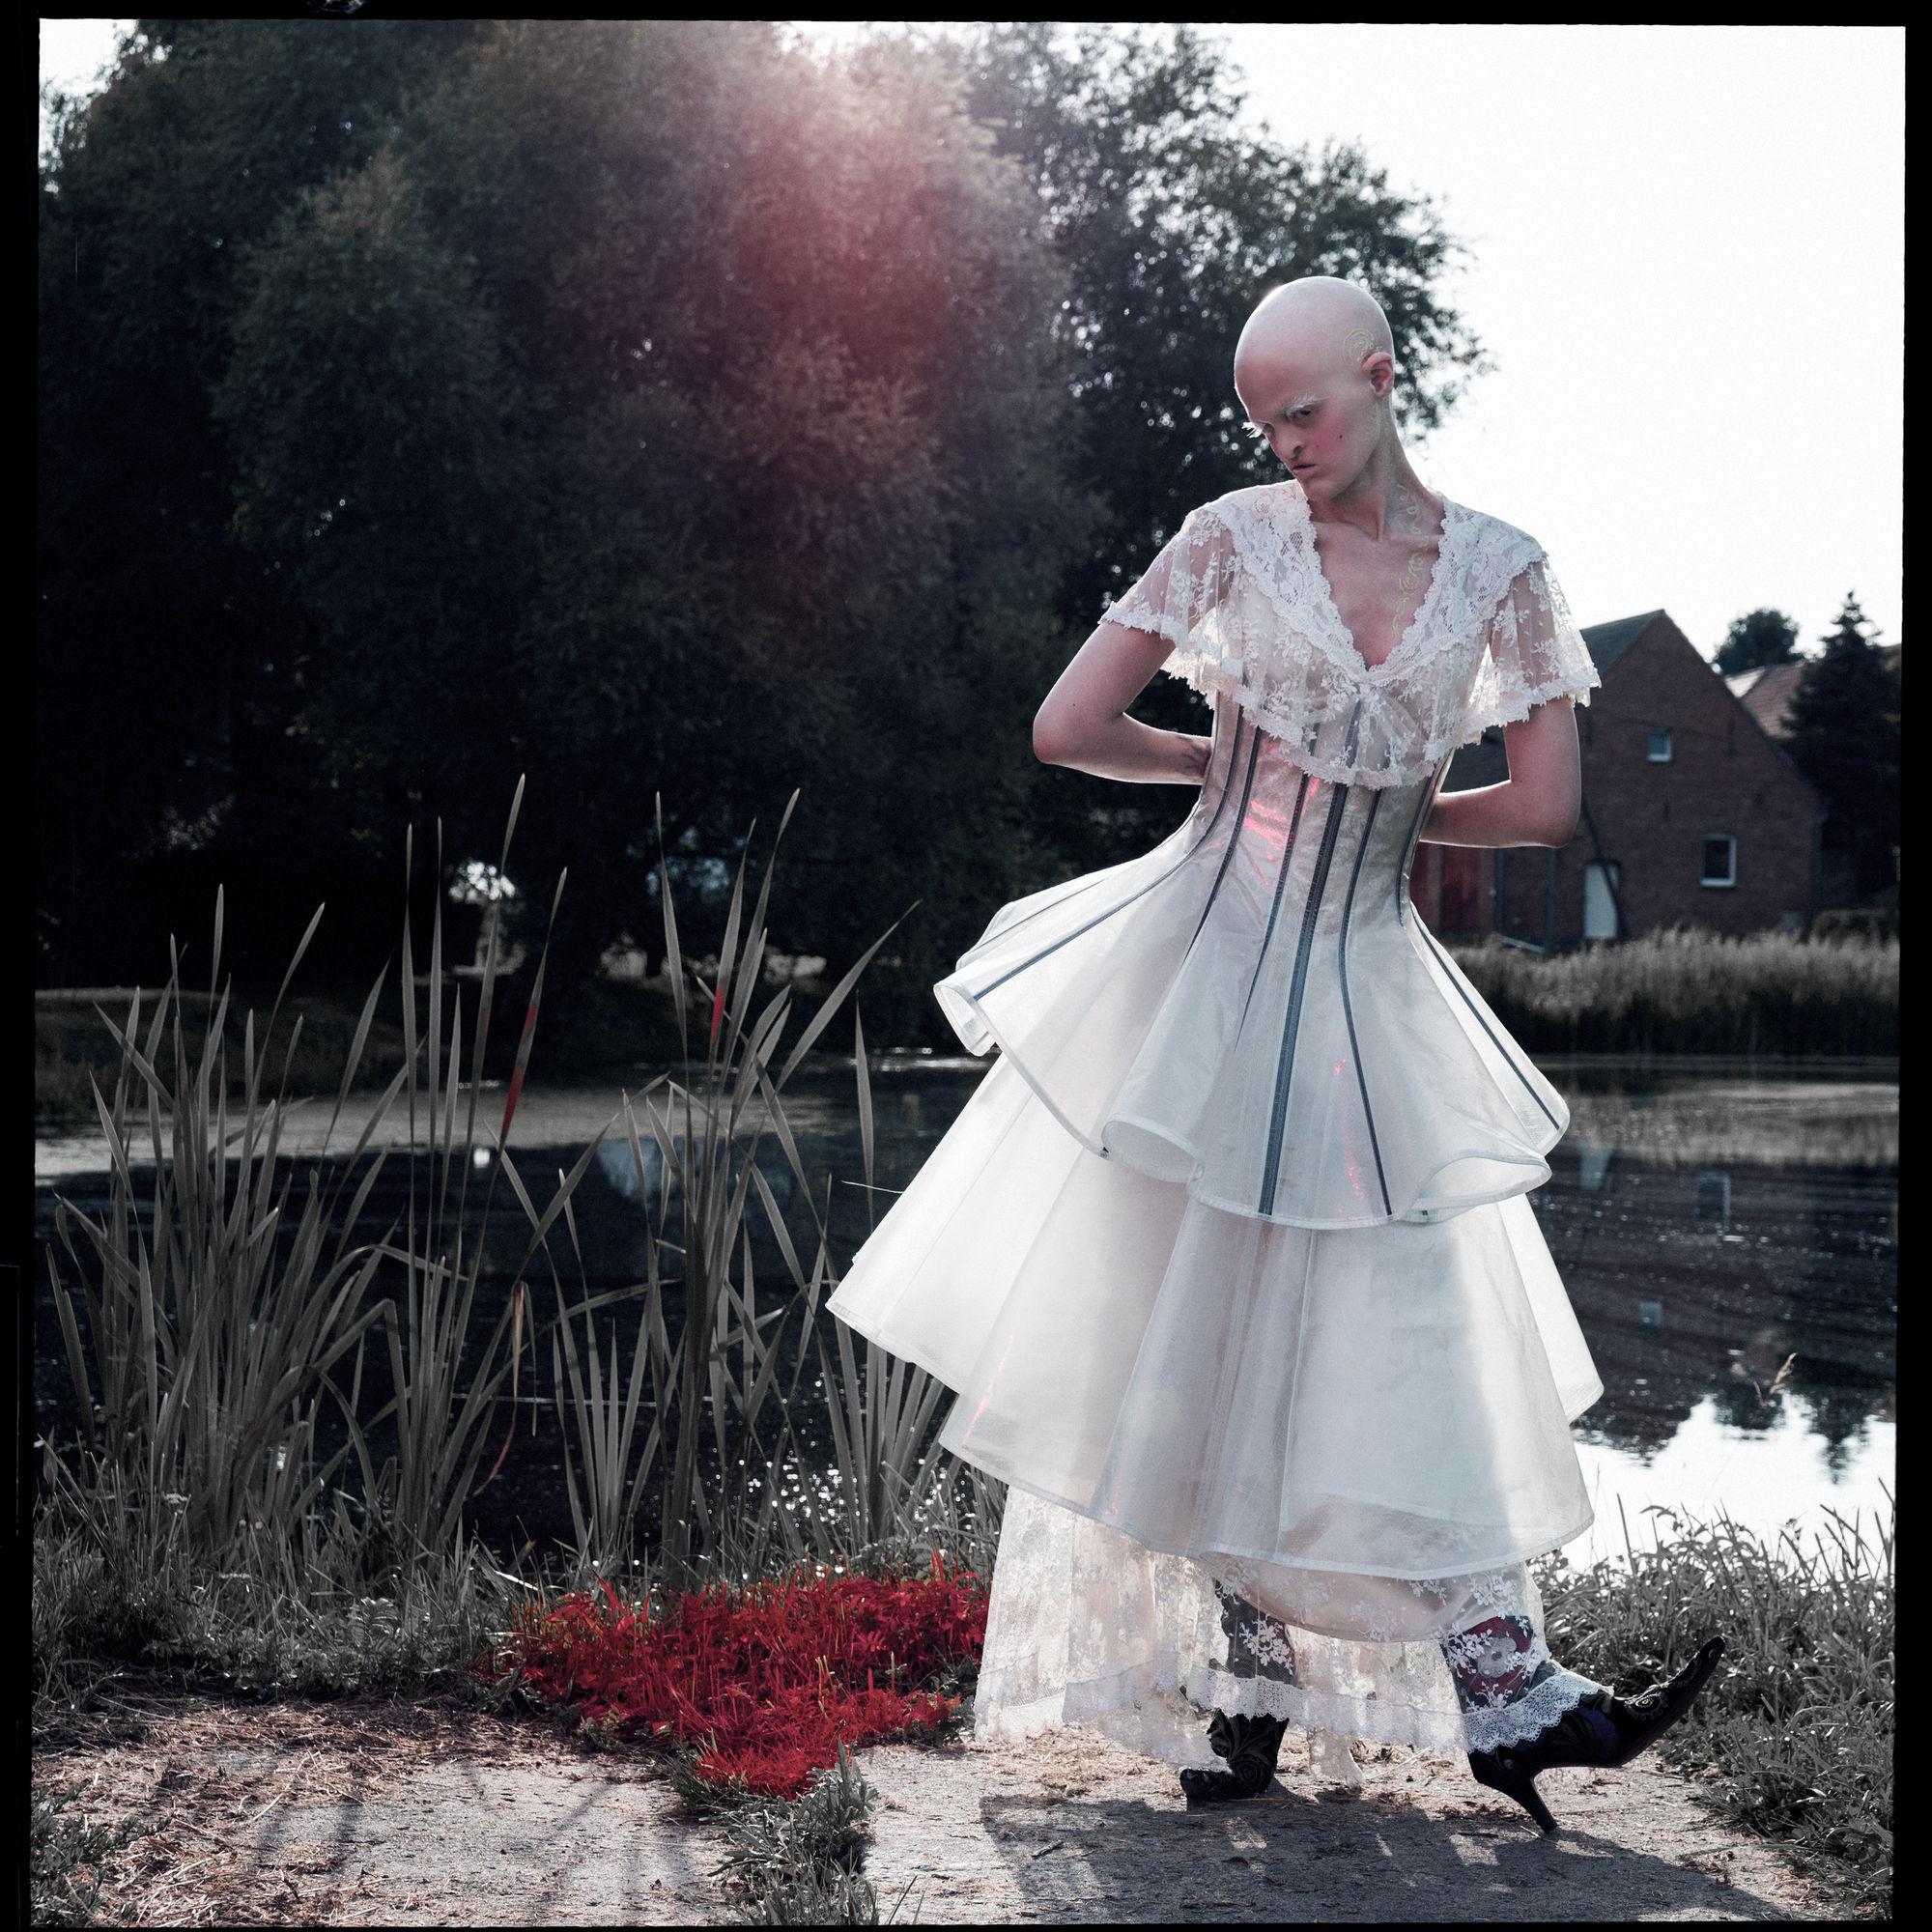 Melanie Gaydos - The Girl Next Door #6